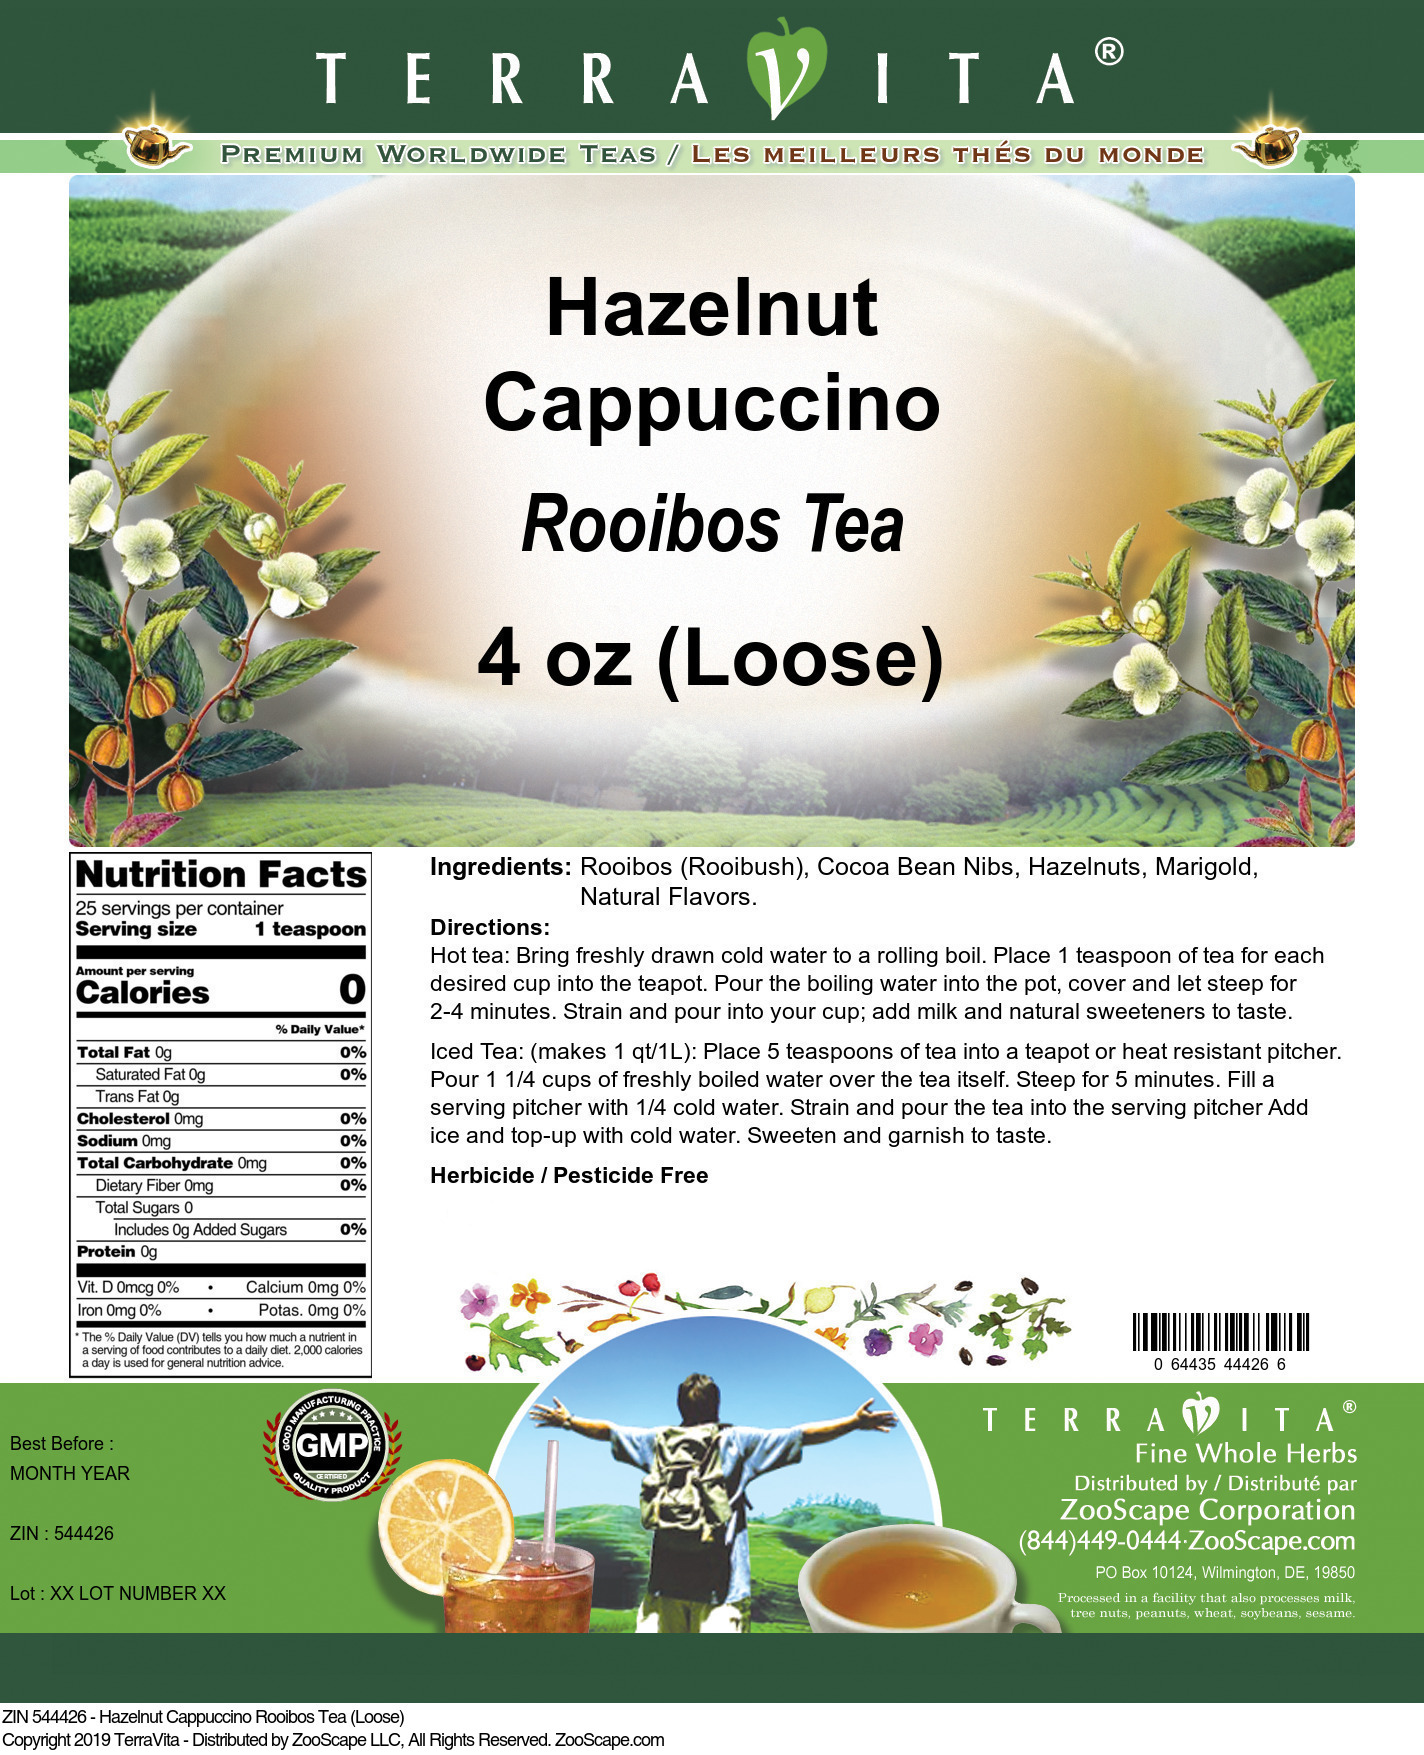 Hazelnut Cappuccino Rooibos Tea (Loose)